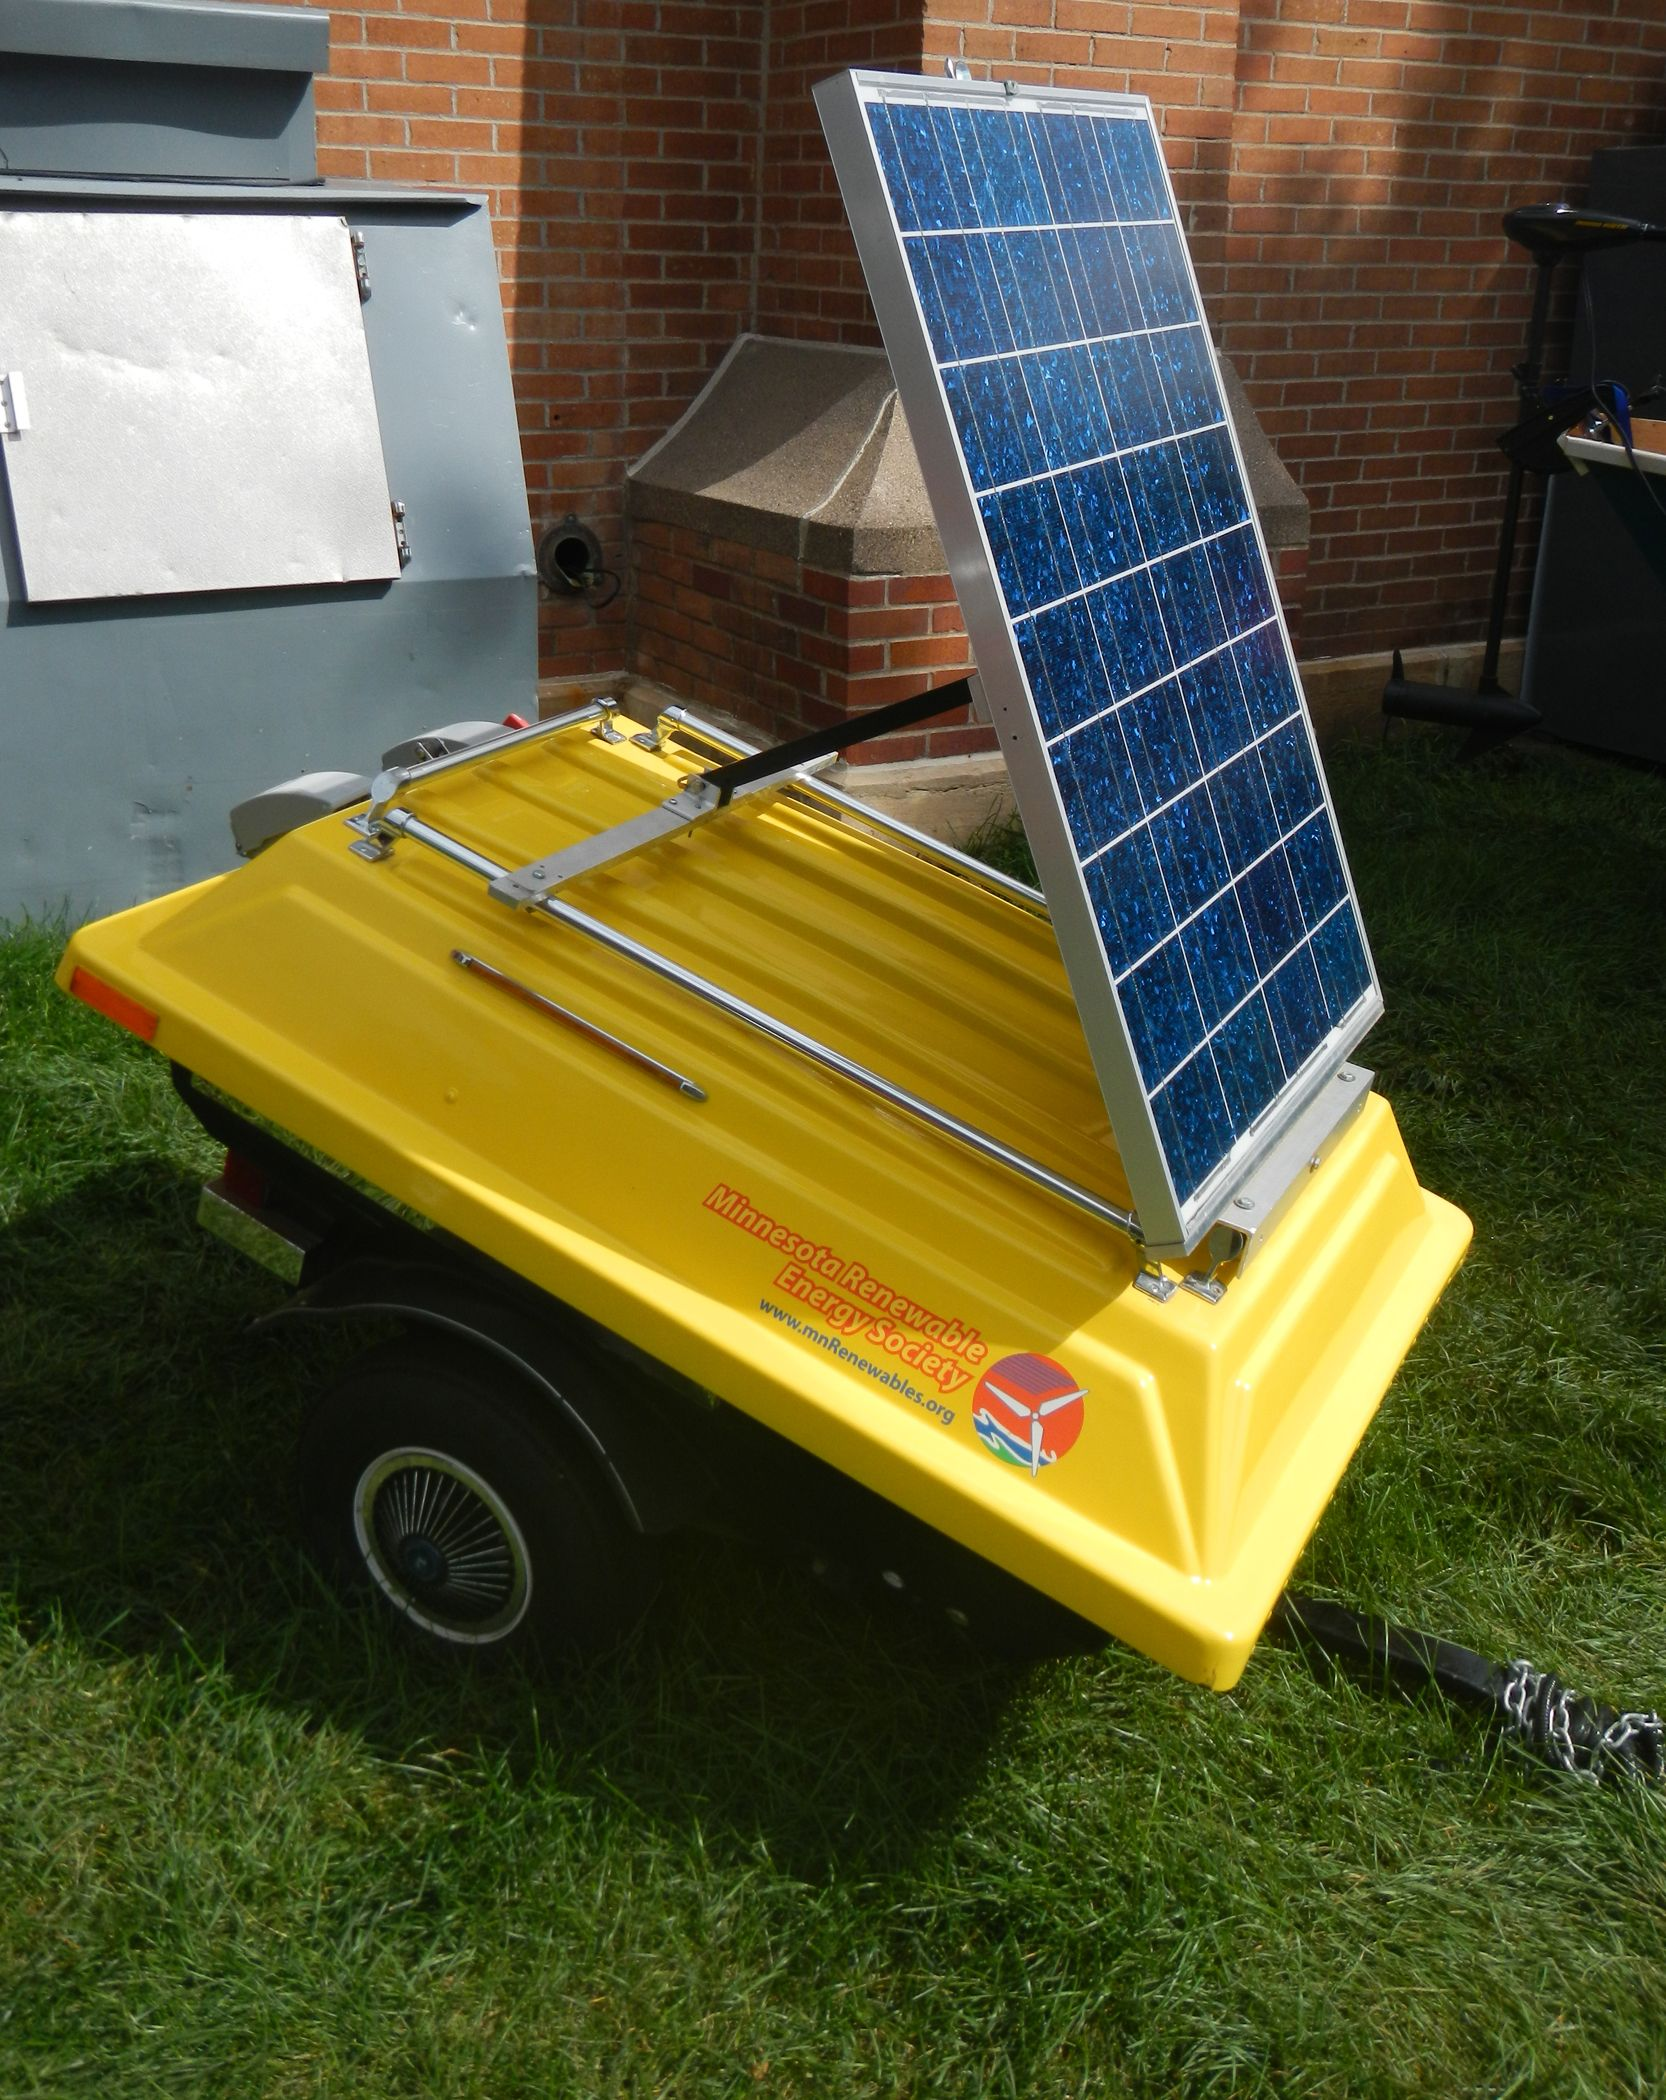 Towable portable solar generator